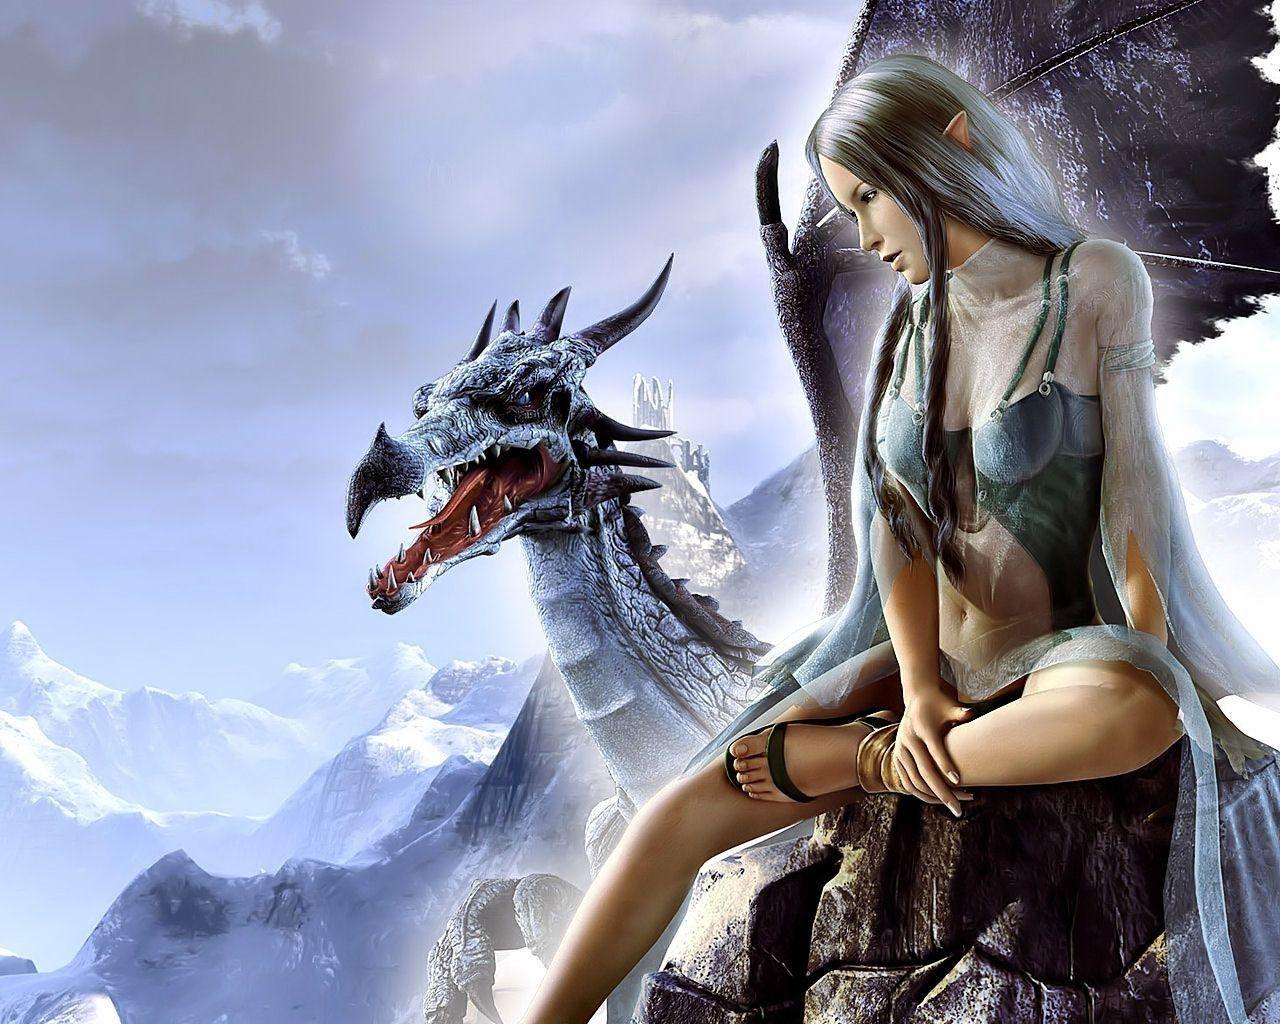 All Free Fantasy Art Goth All World Wallpapers 3d Fantasy Art